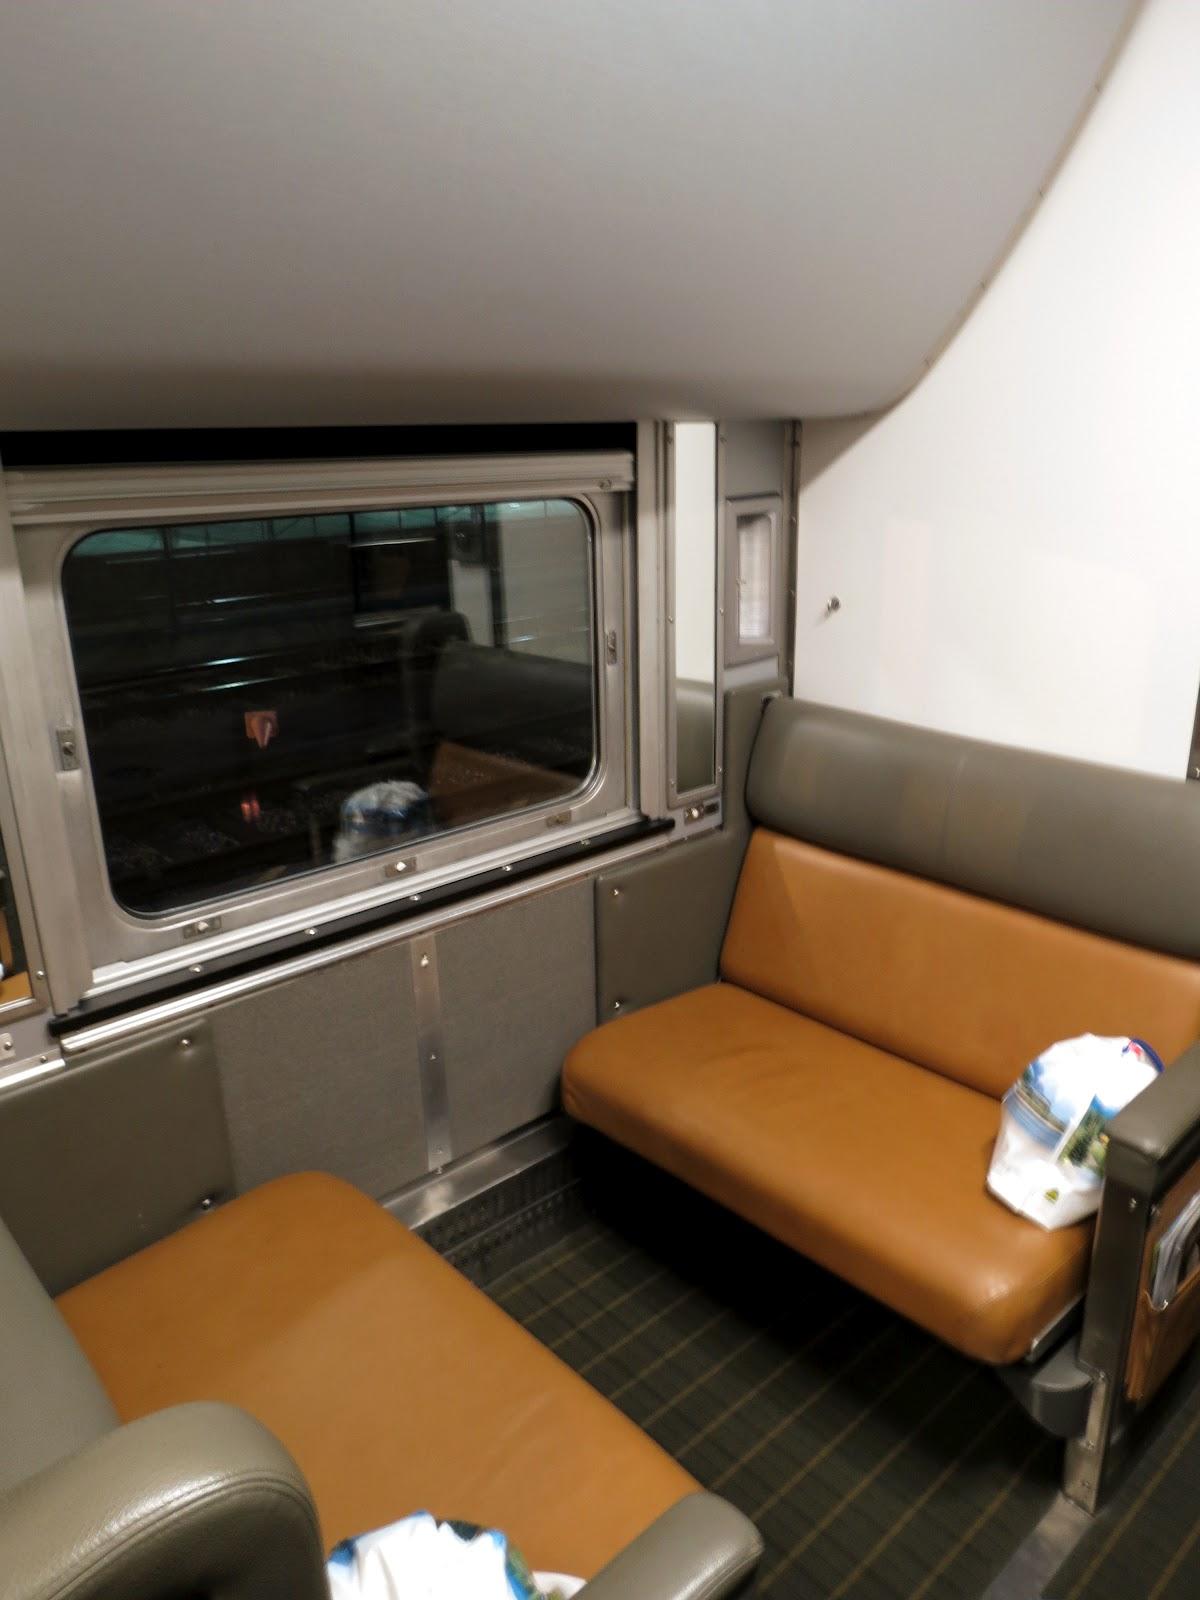 2 Bedroom Cabins Destination Mike Via Rail Sleeper Plus Class Berths